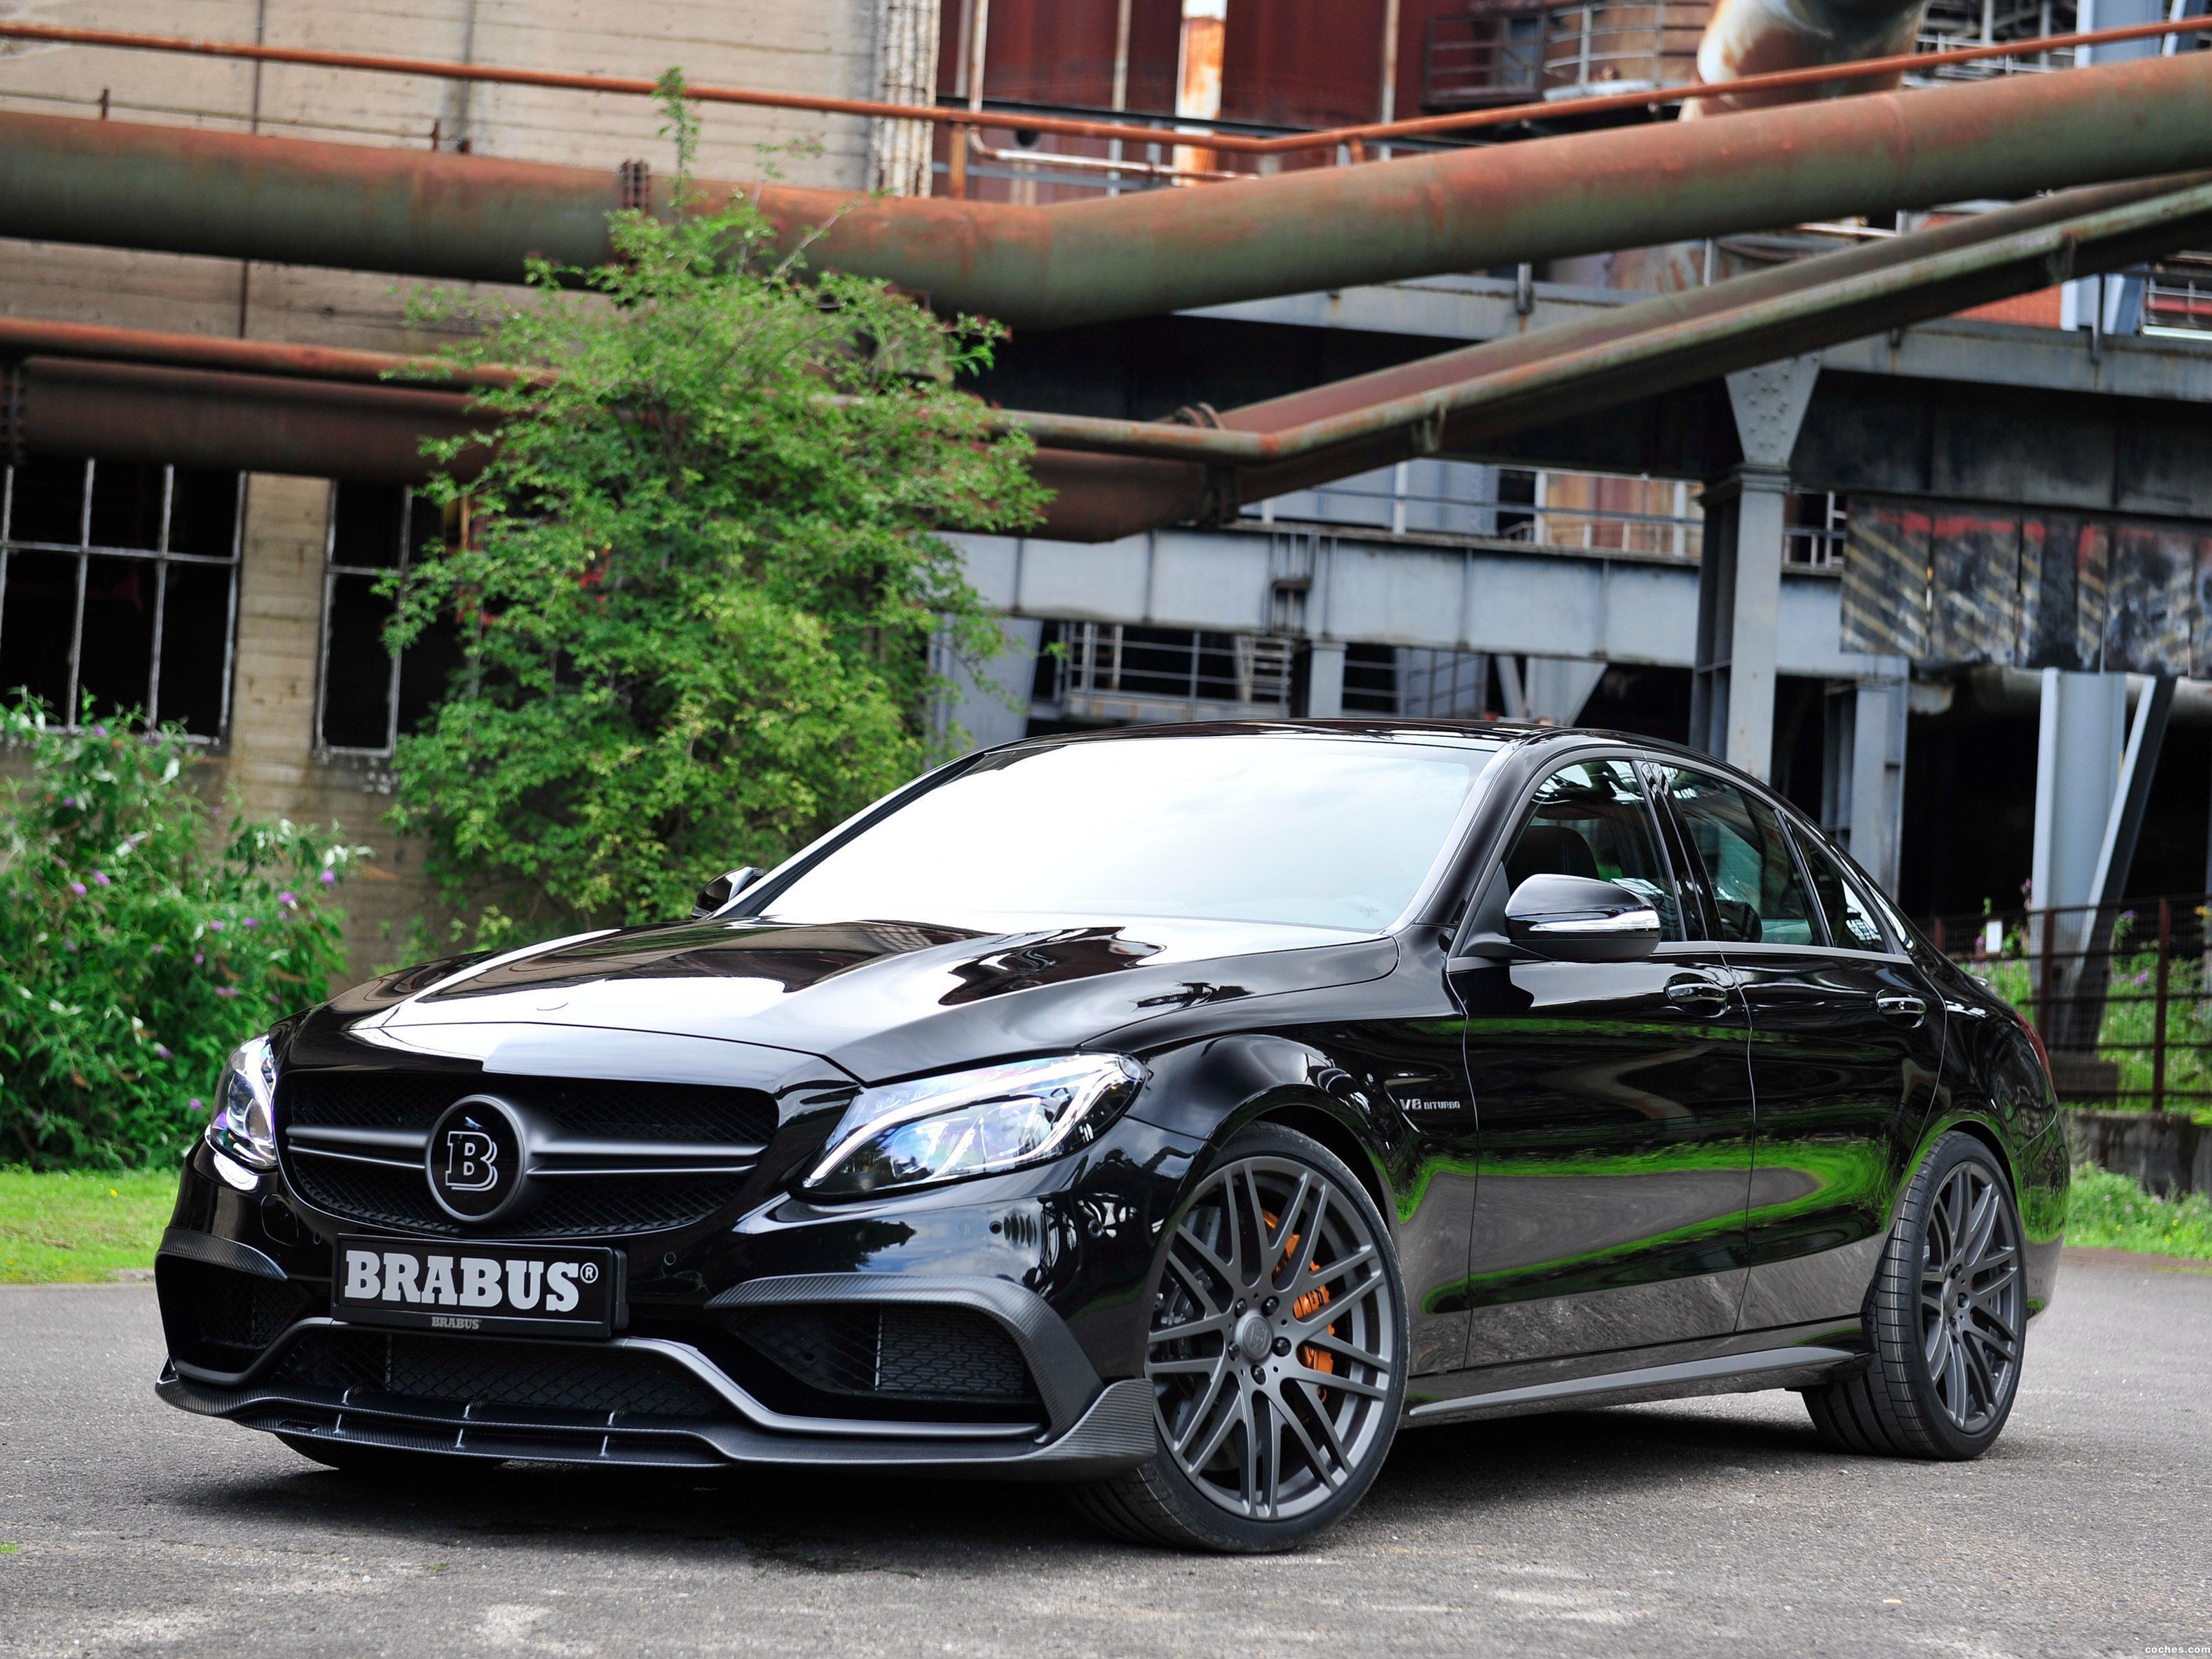 Foto 0 de Brabus Mercedes AMG C 63 S W205 2015